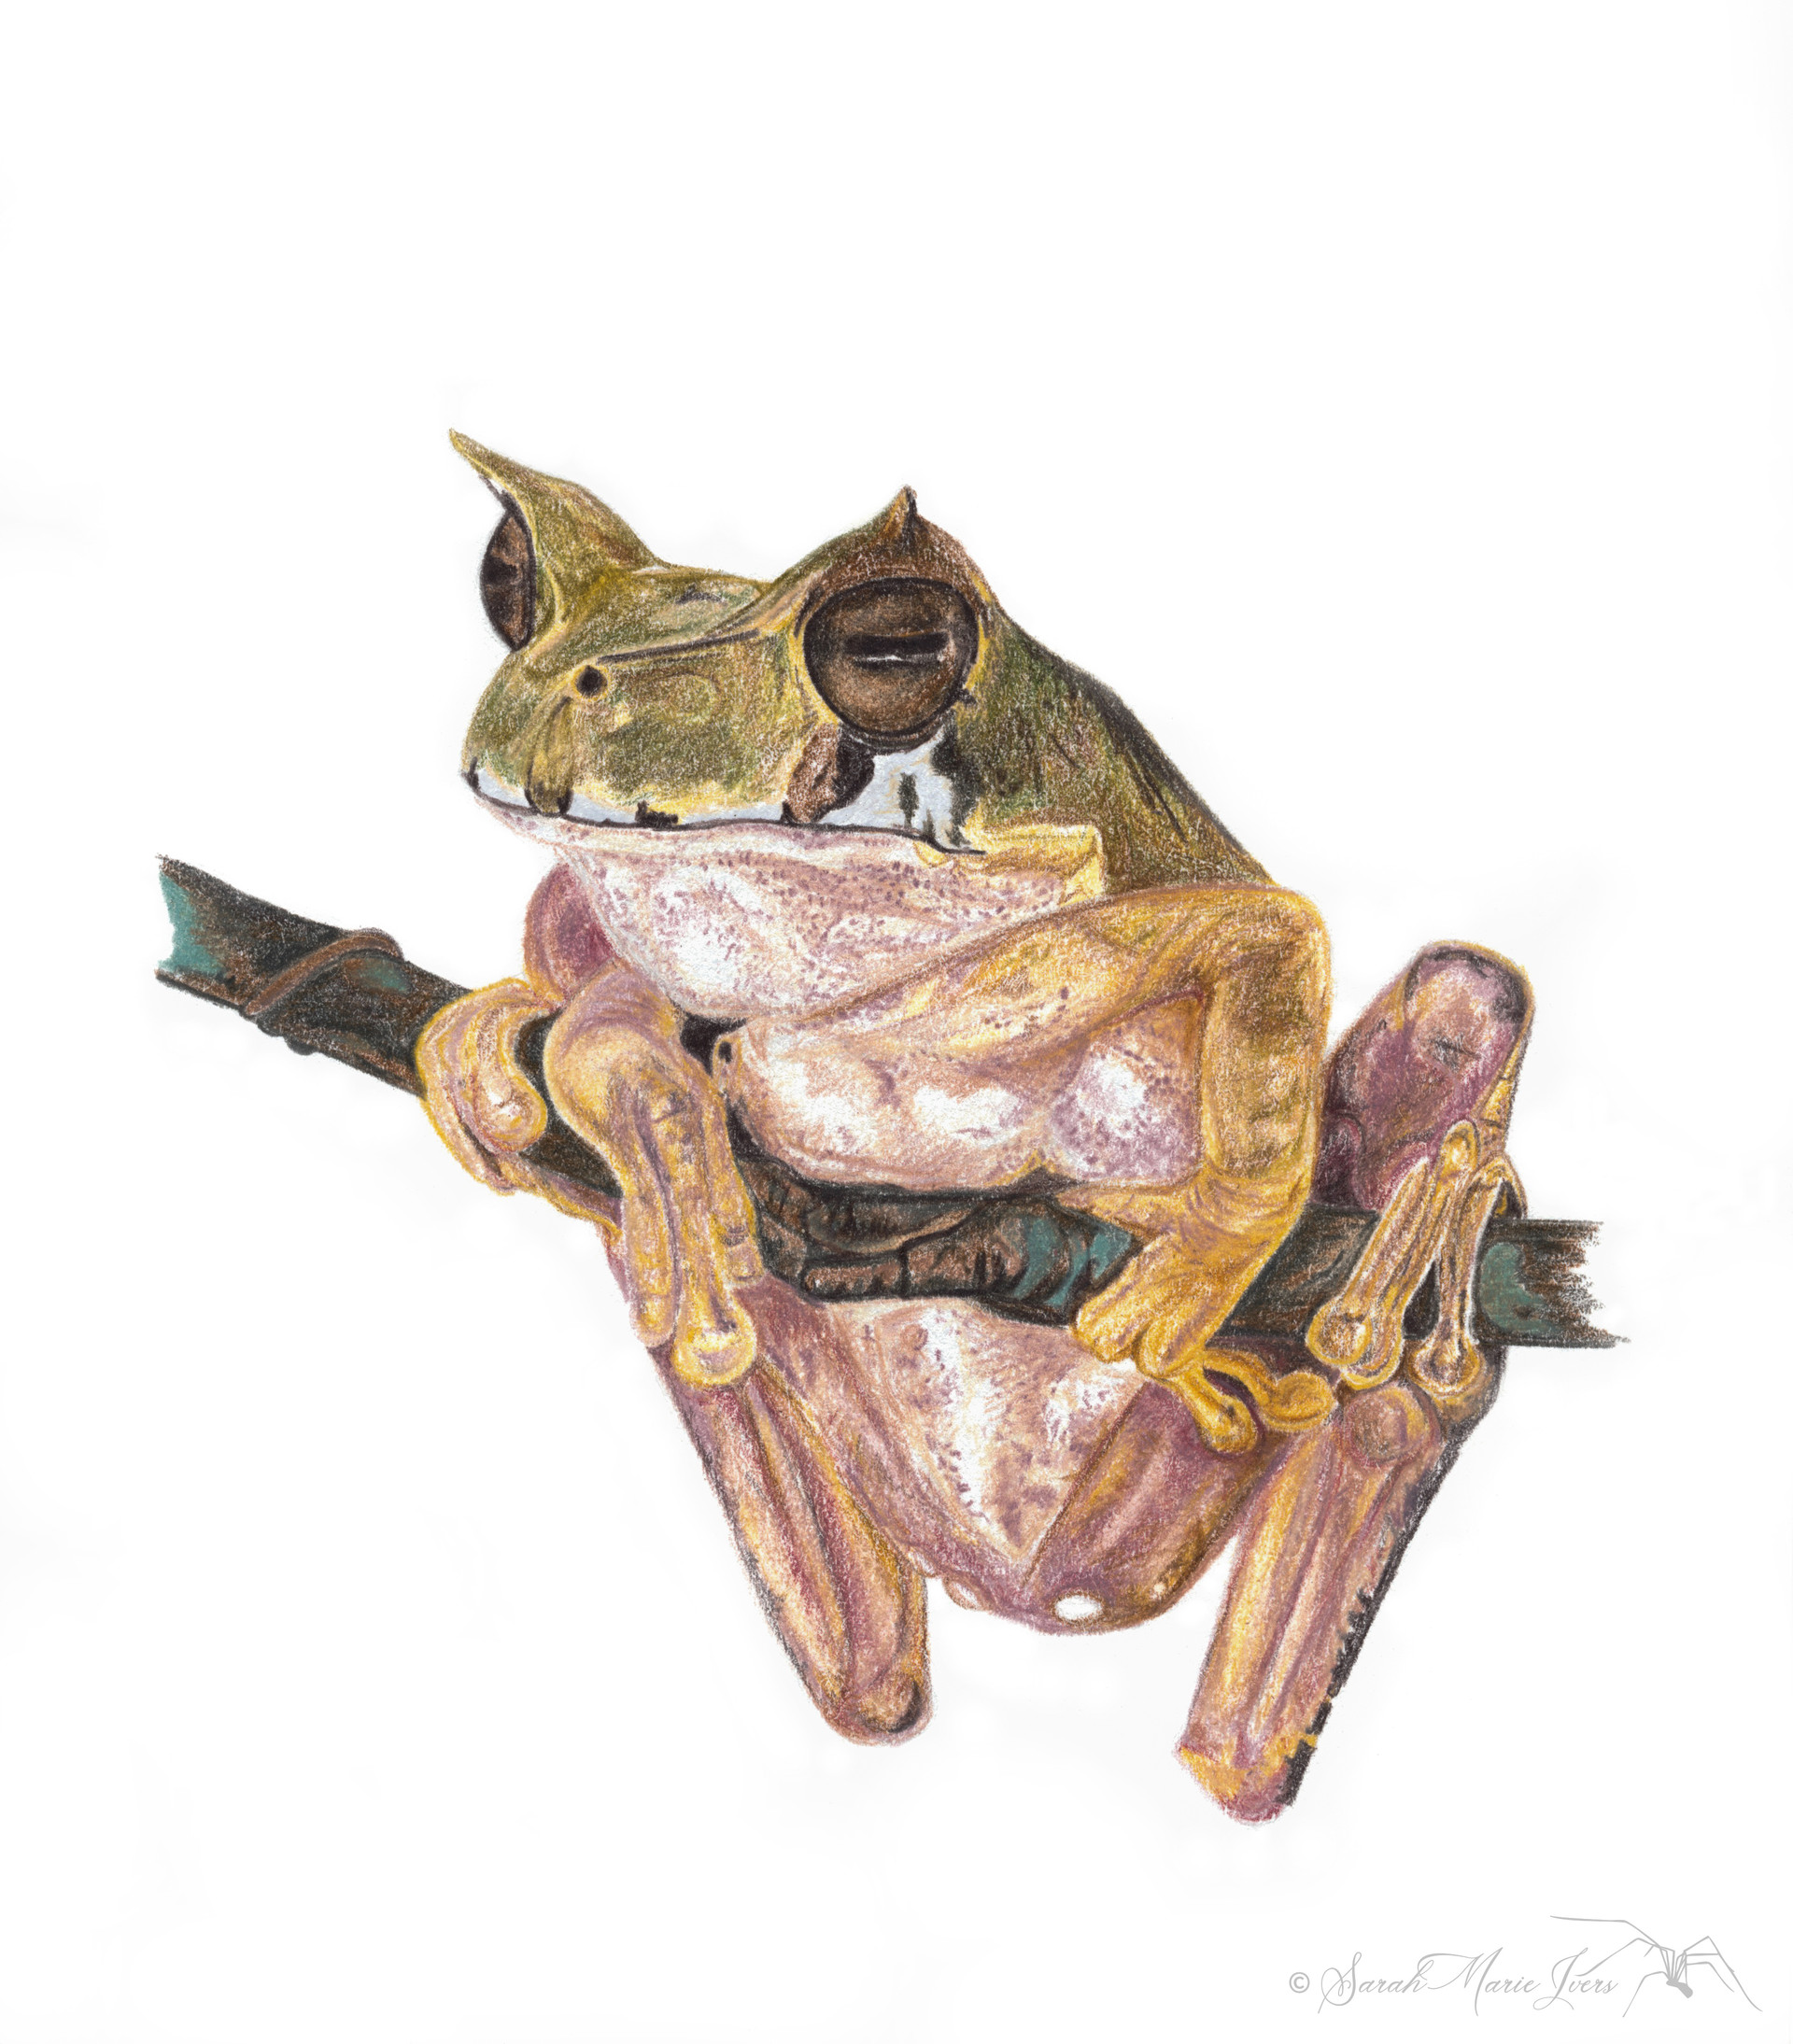 Hooded Marsupial Frog